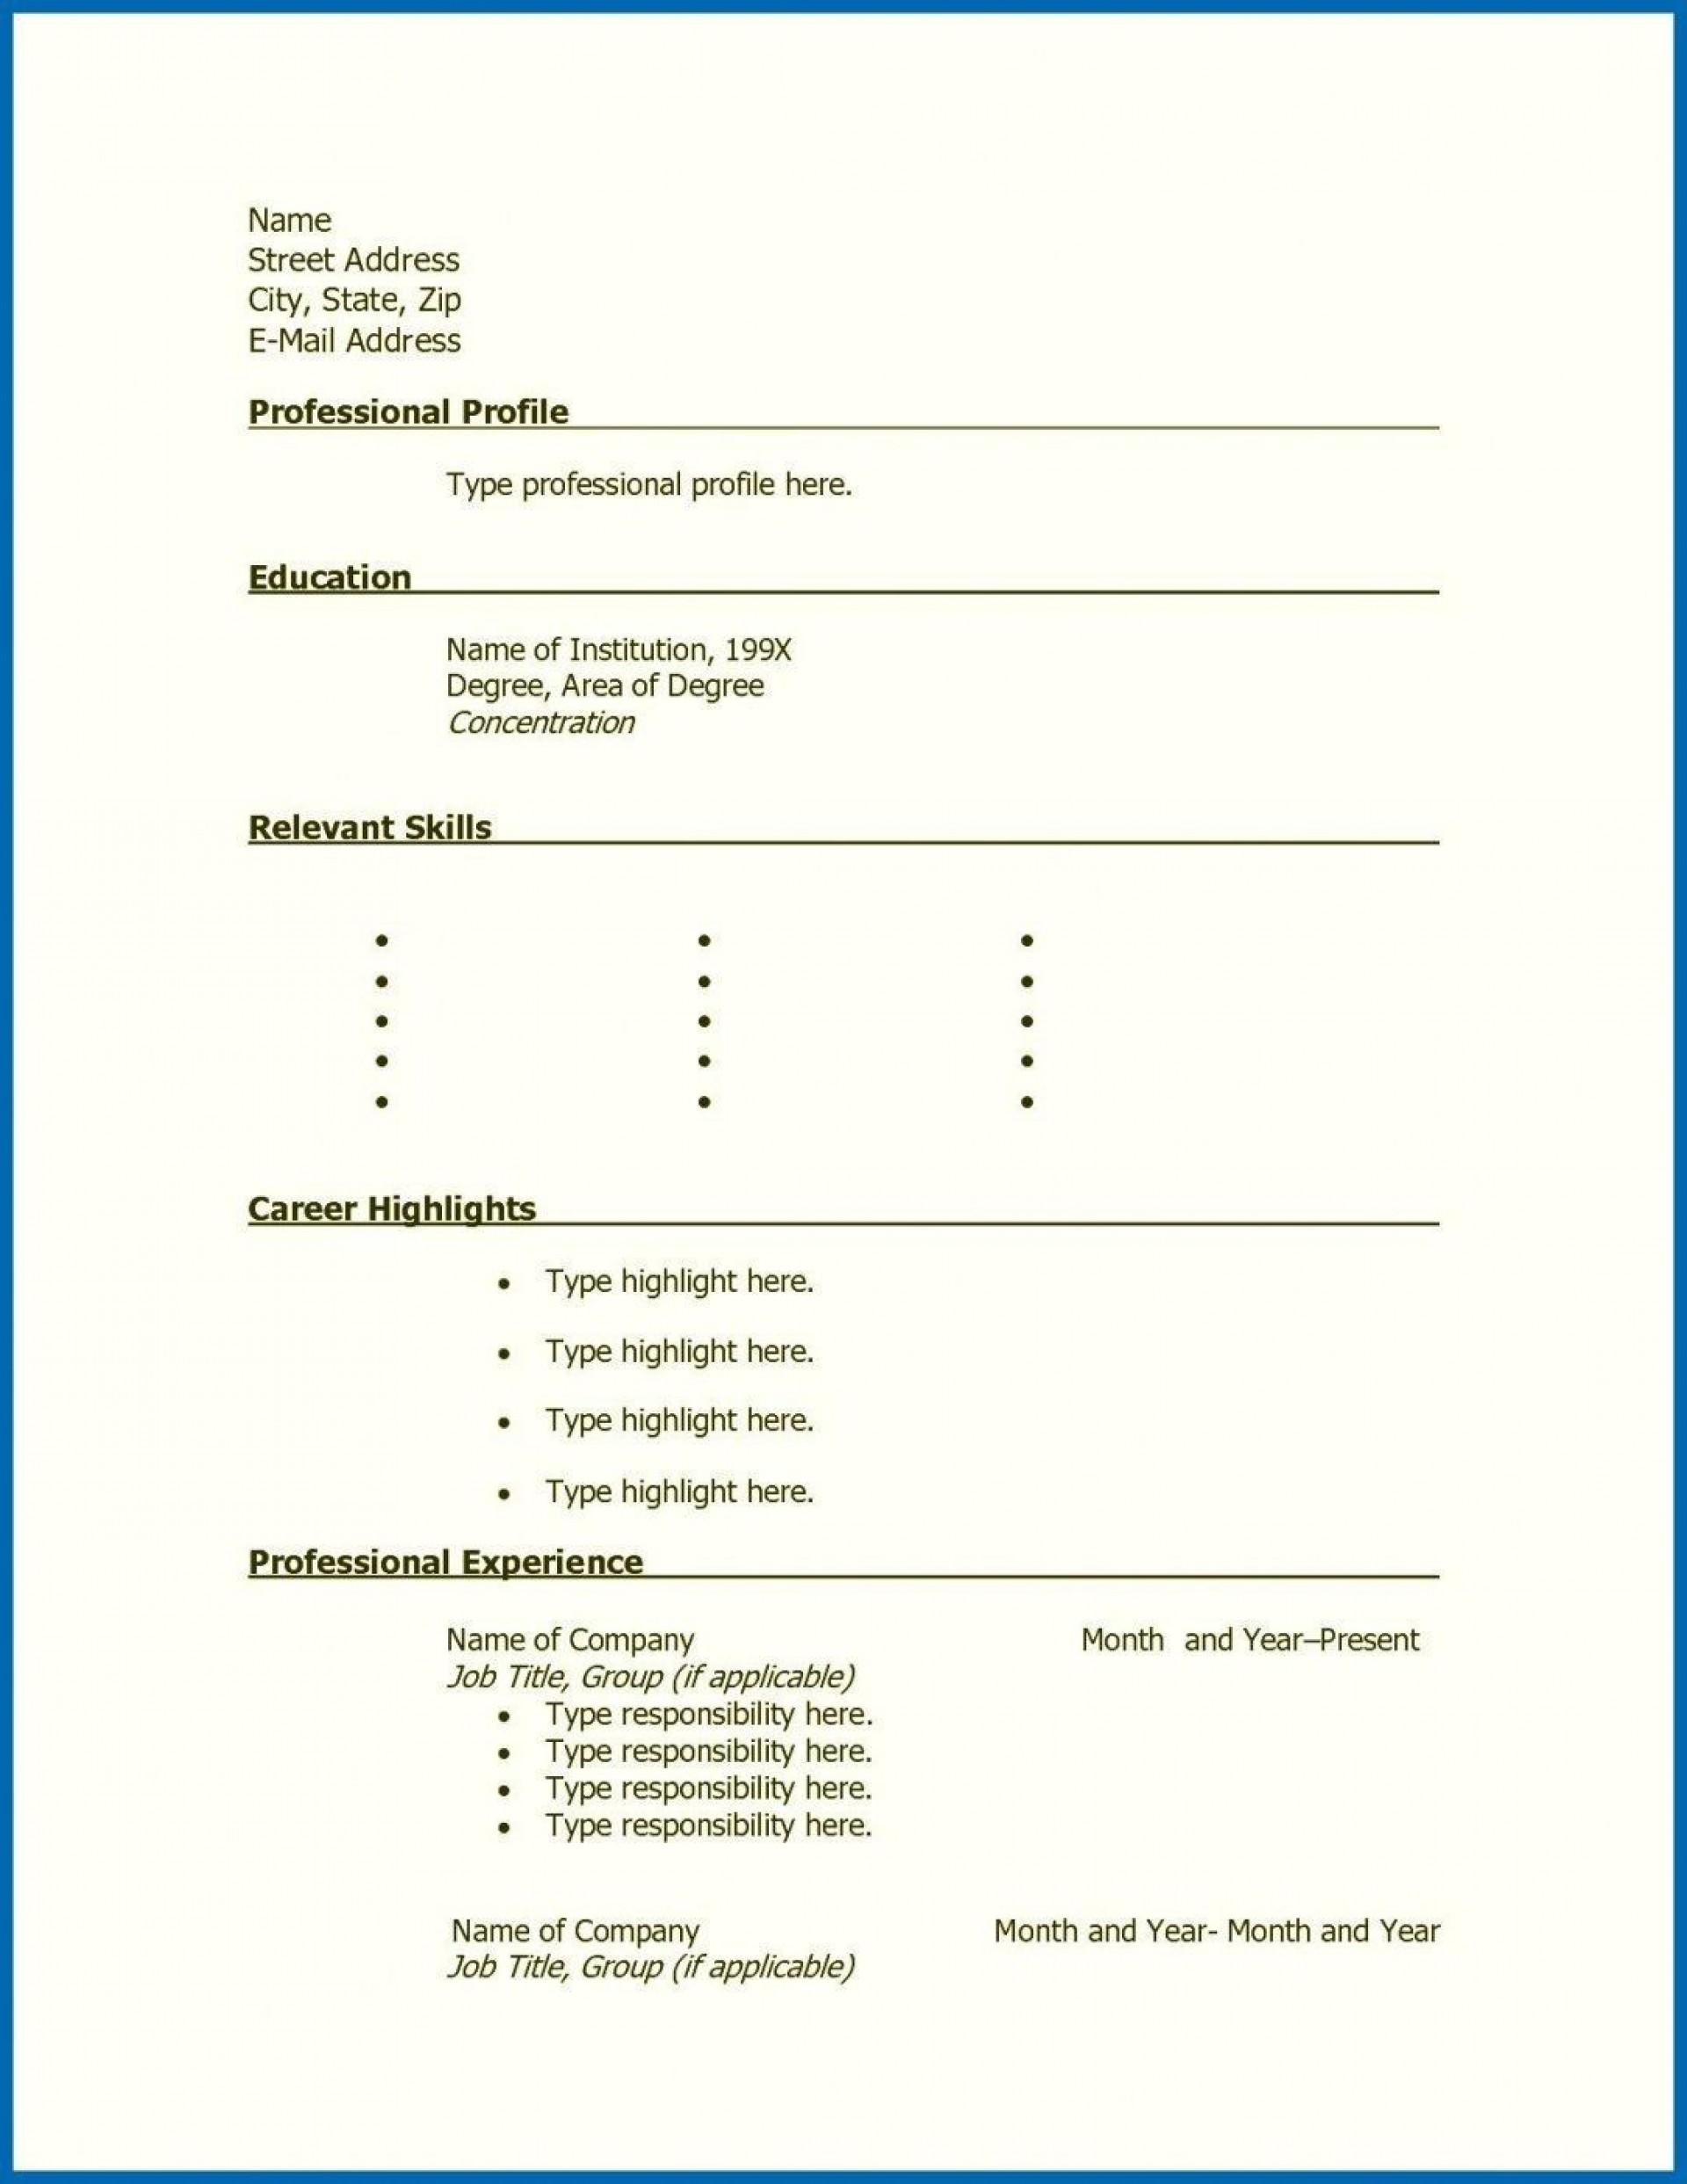 001 Stunning Free Printable Resume Template Blank Sample  Fill1920